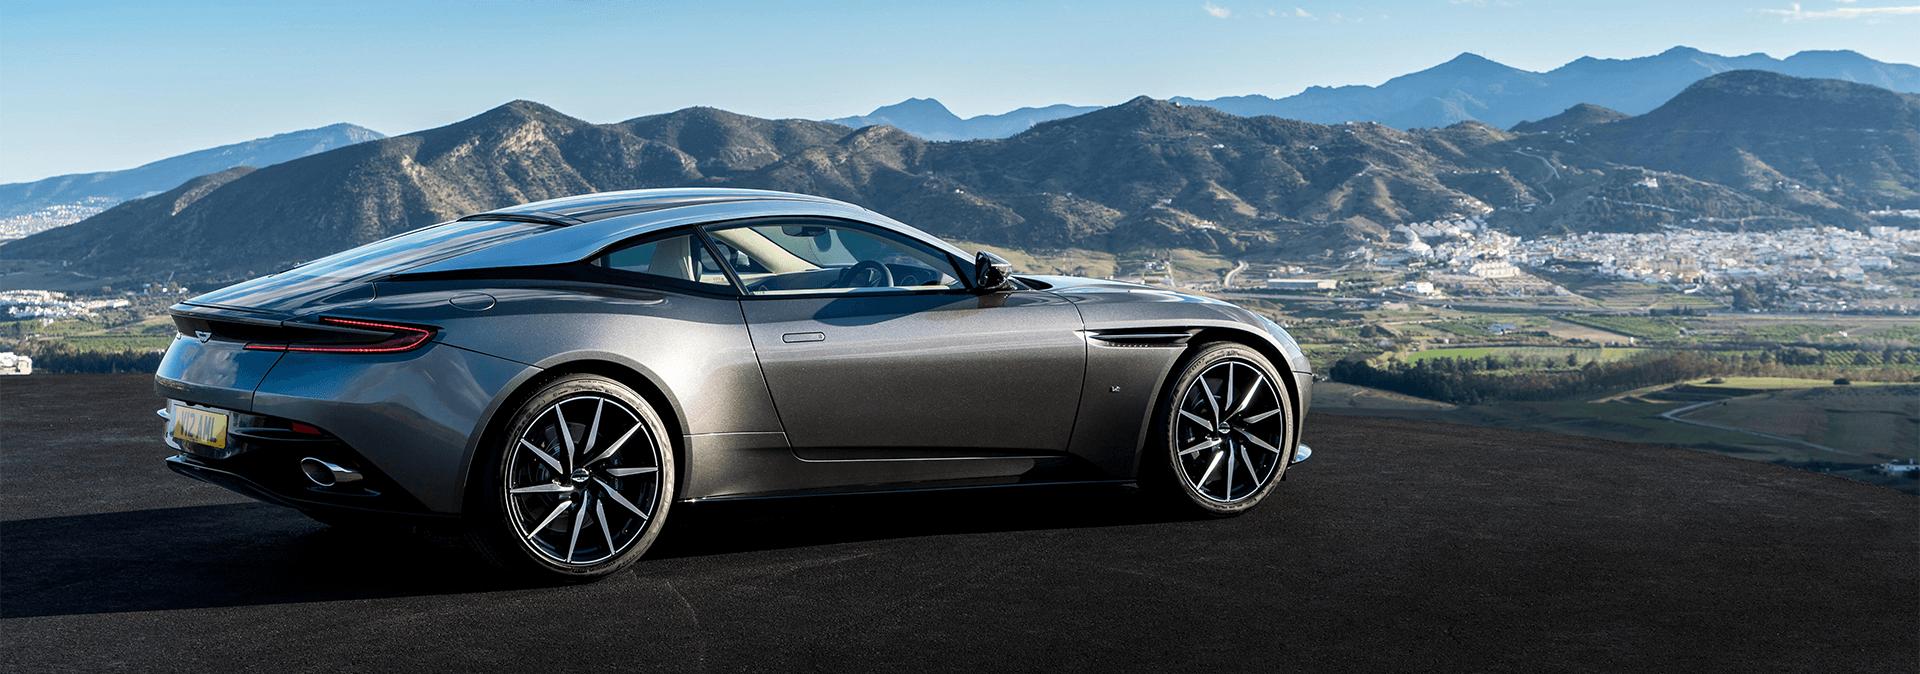 Used Aston Martin car image